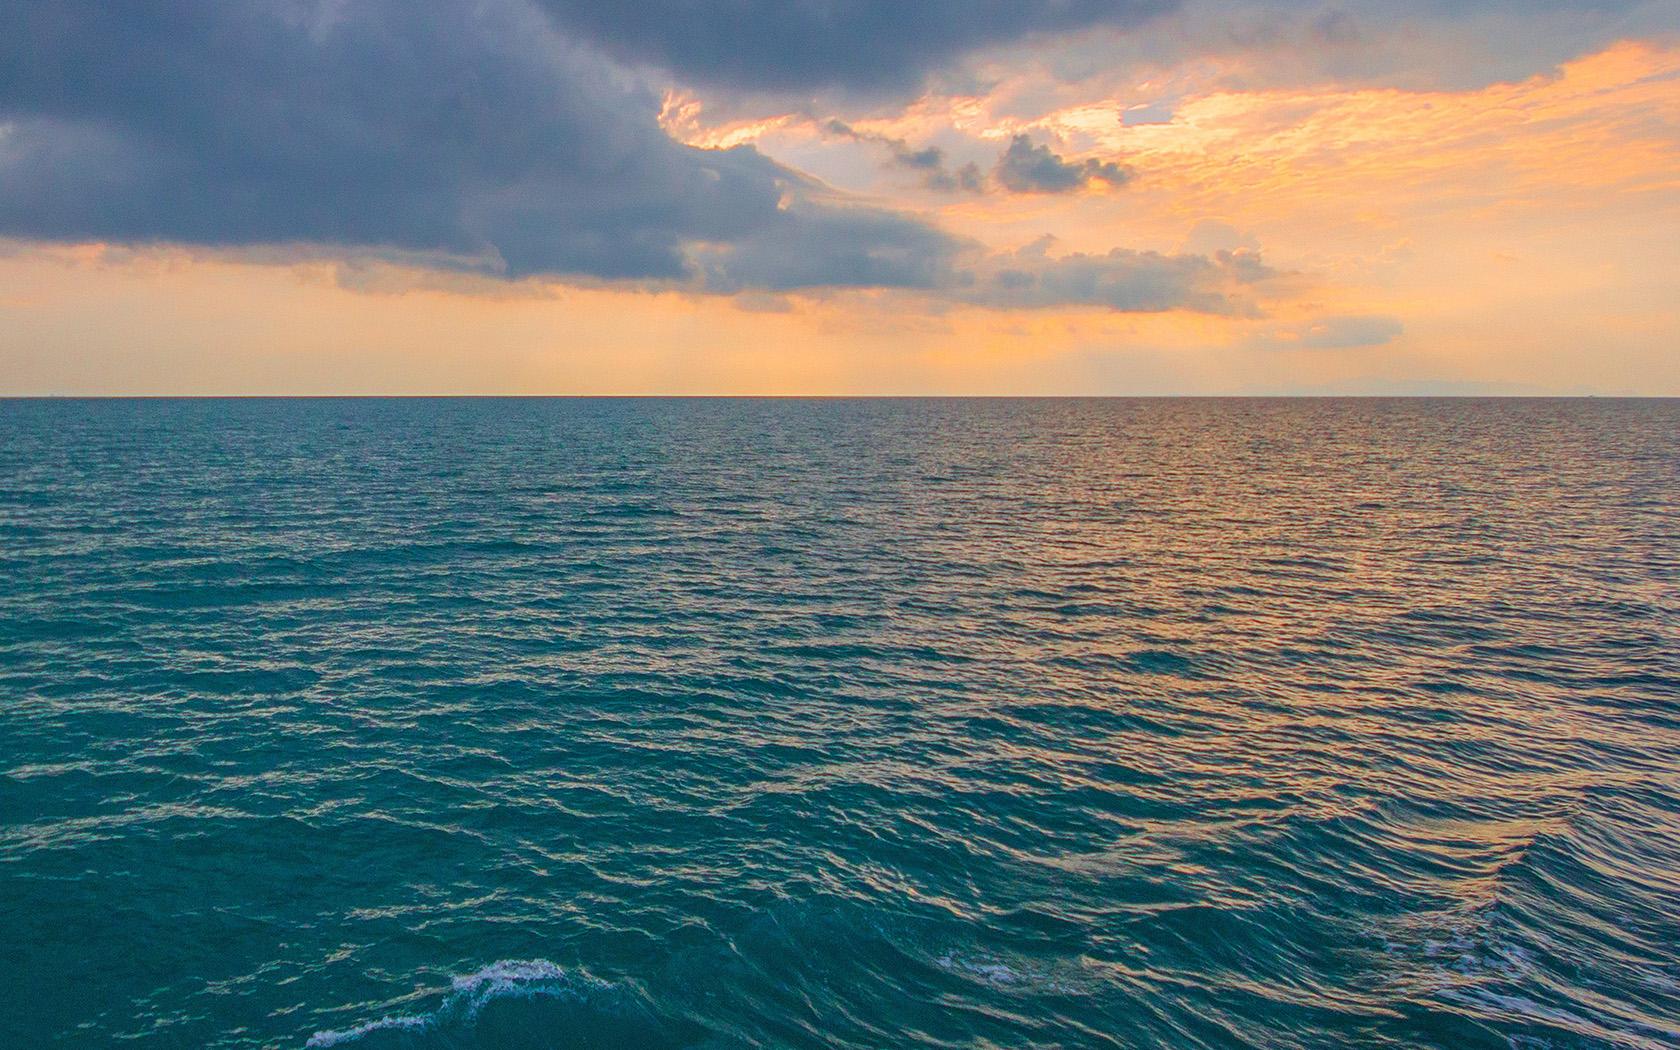 nx09-sunny-sea-sunset-ocean-water-nature-wallpaper